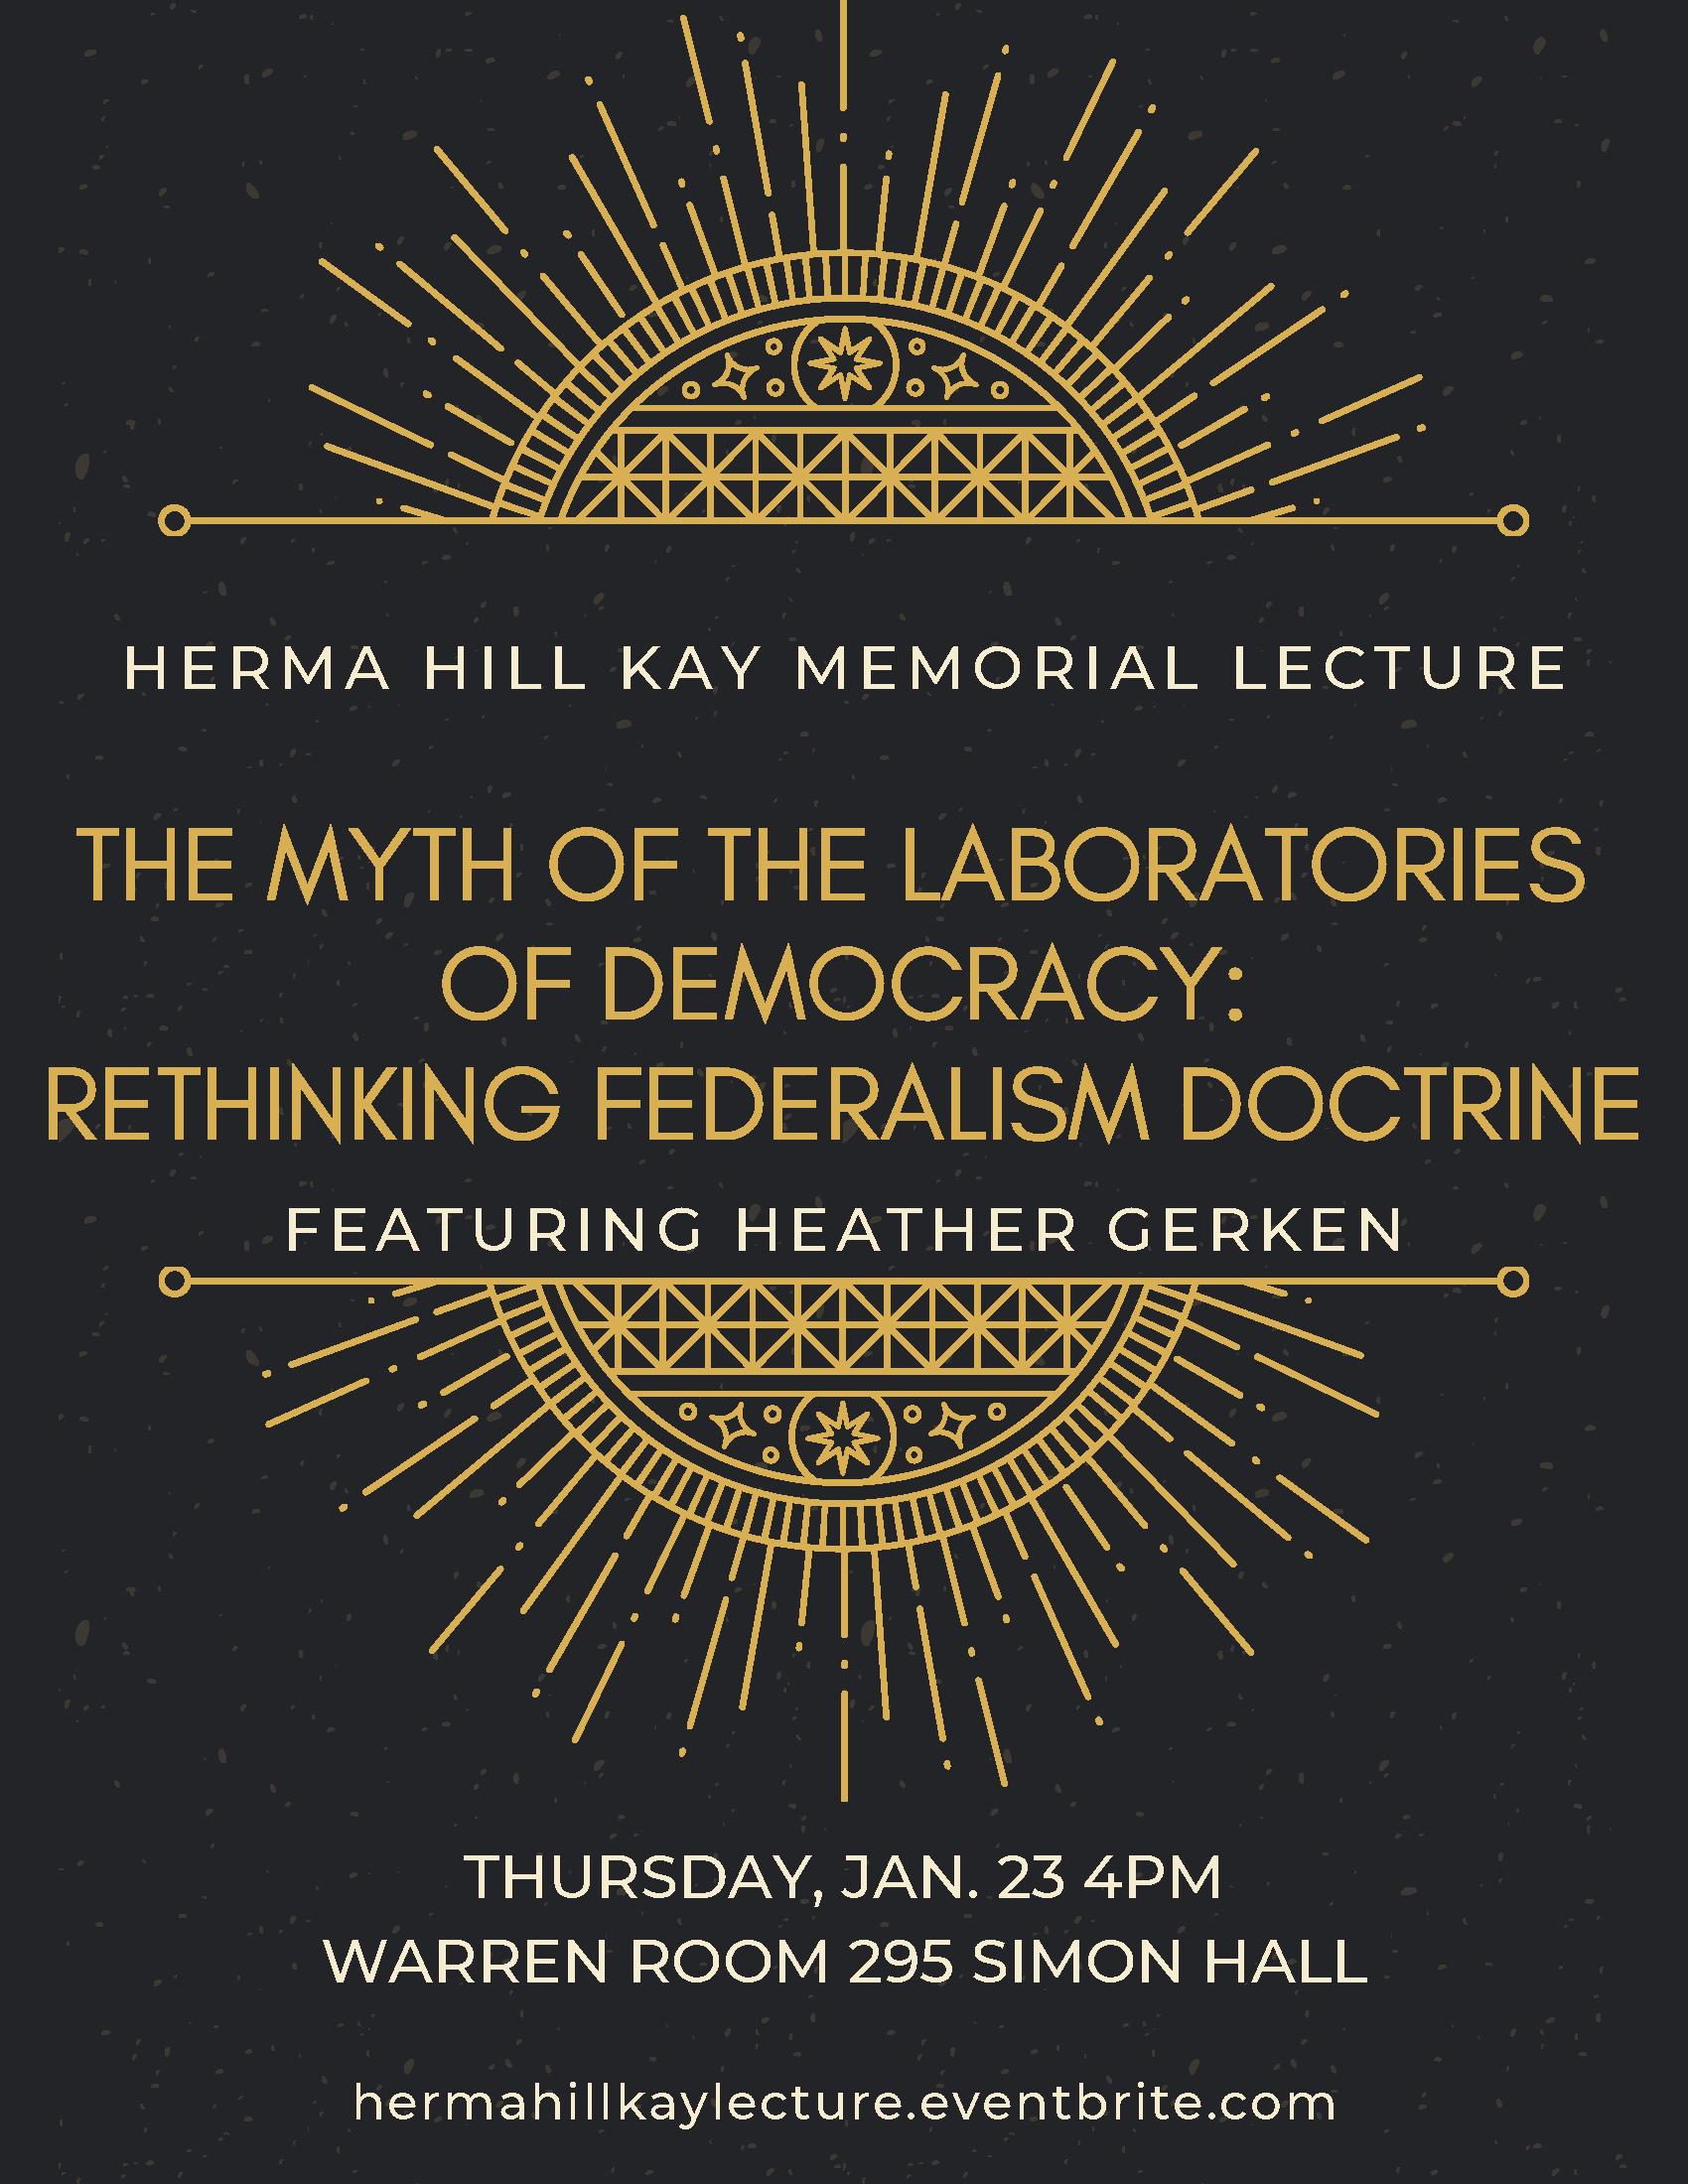 HHK Memorial Lecture Flyer